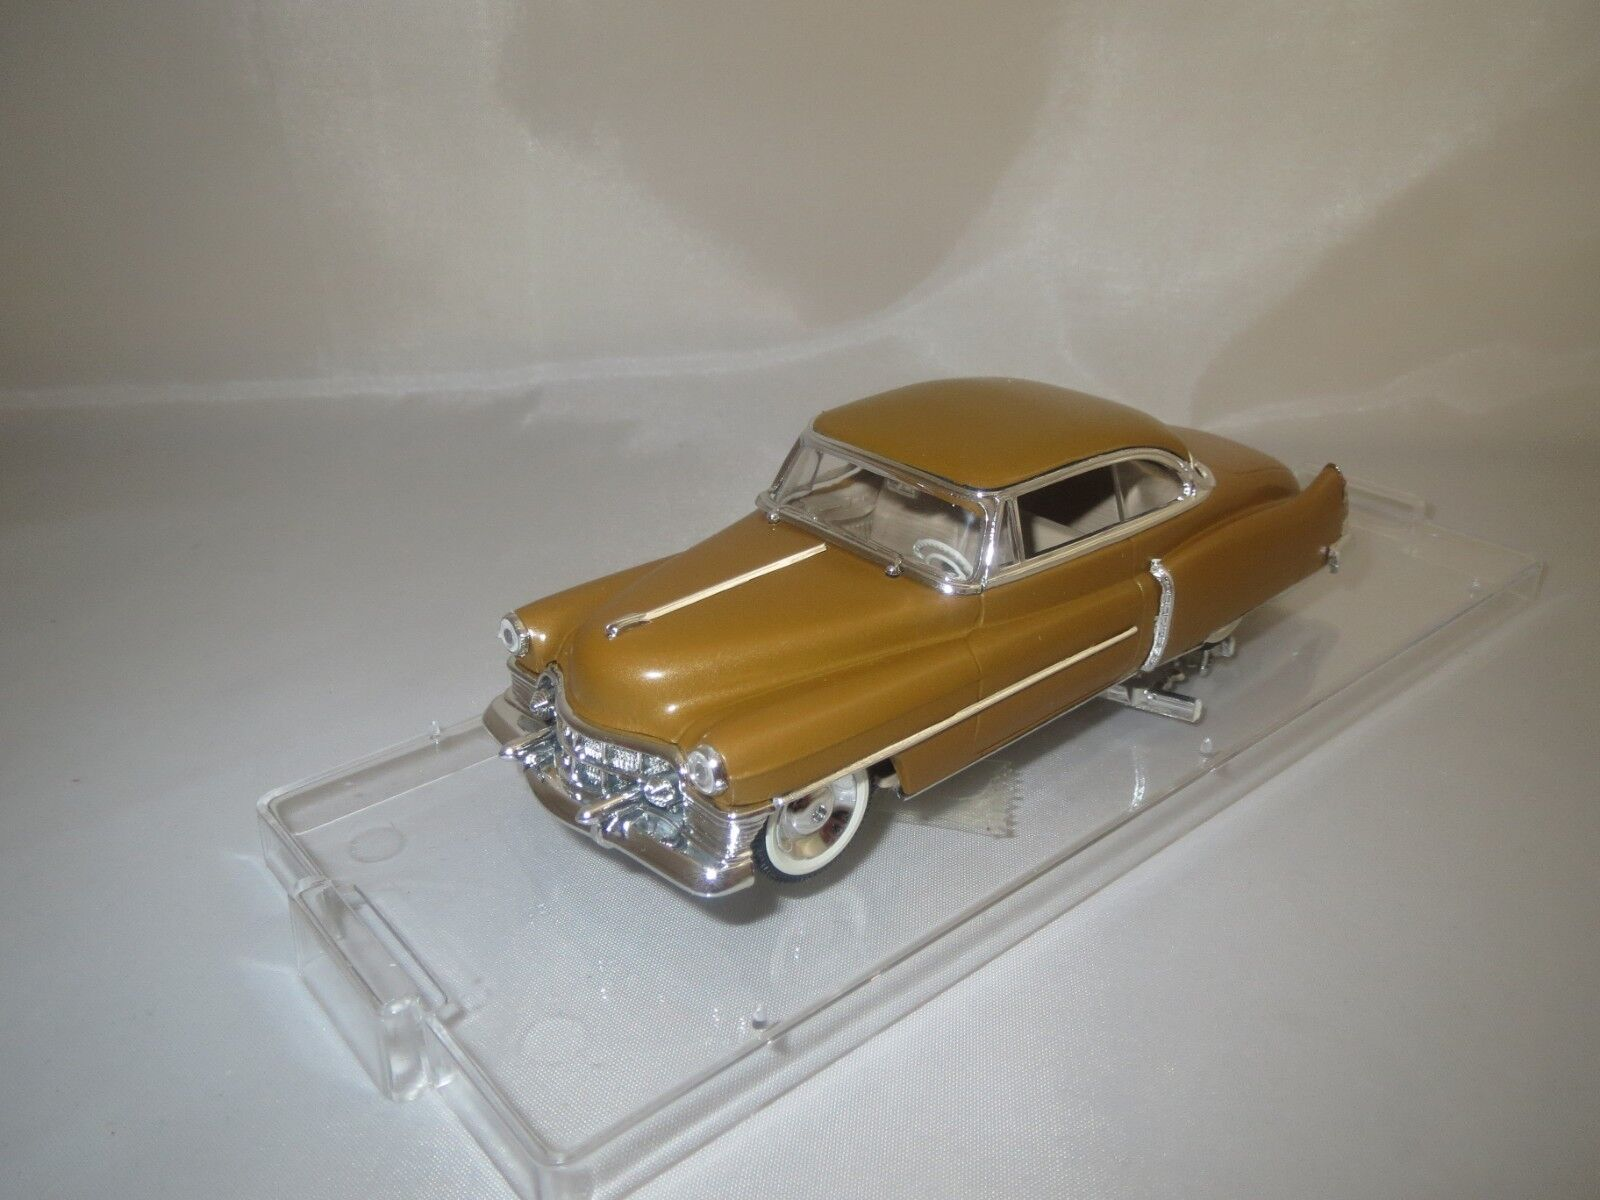 Vitesse Cadillac Coupè Type 62  1950  (Or-Marron) 1 43 neuf dans sa boîte